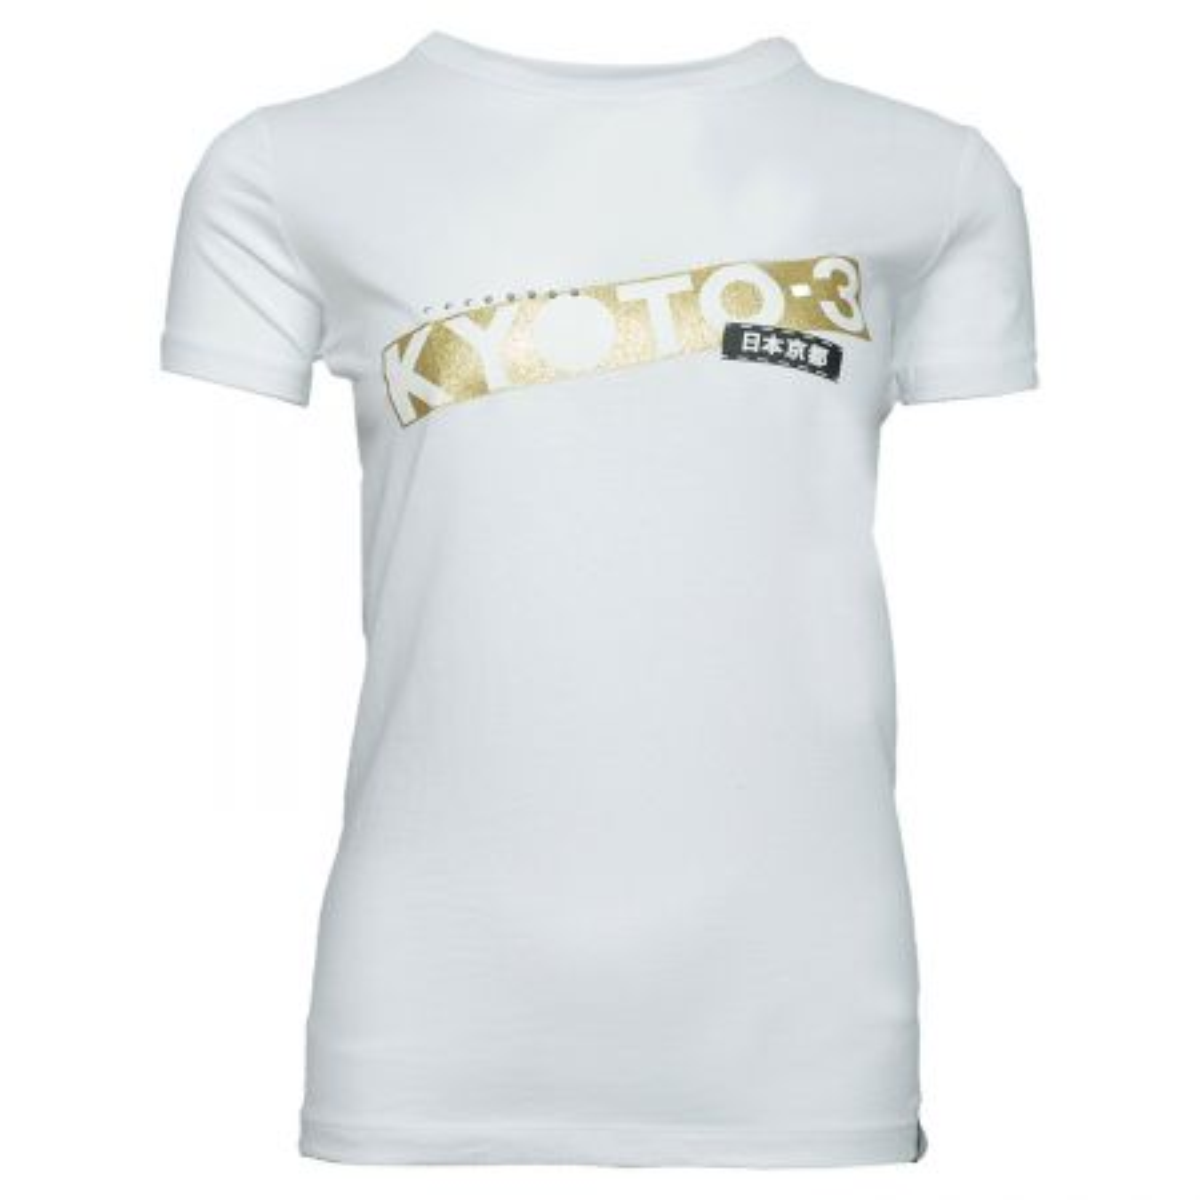 KYOTO-3 Hallmark majica